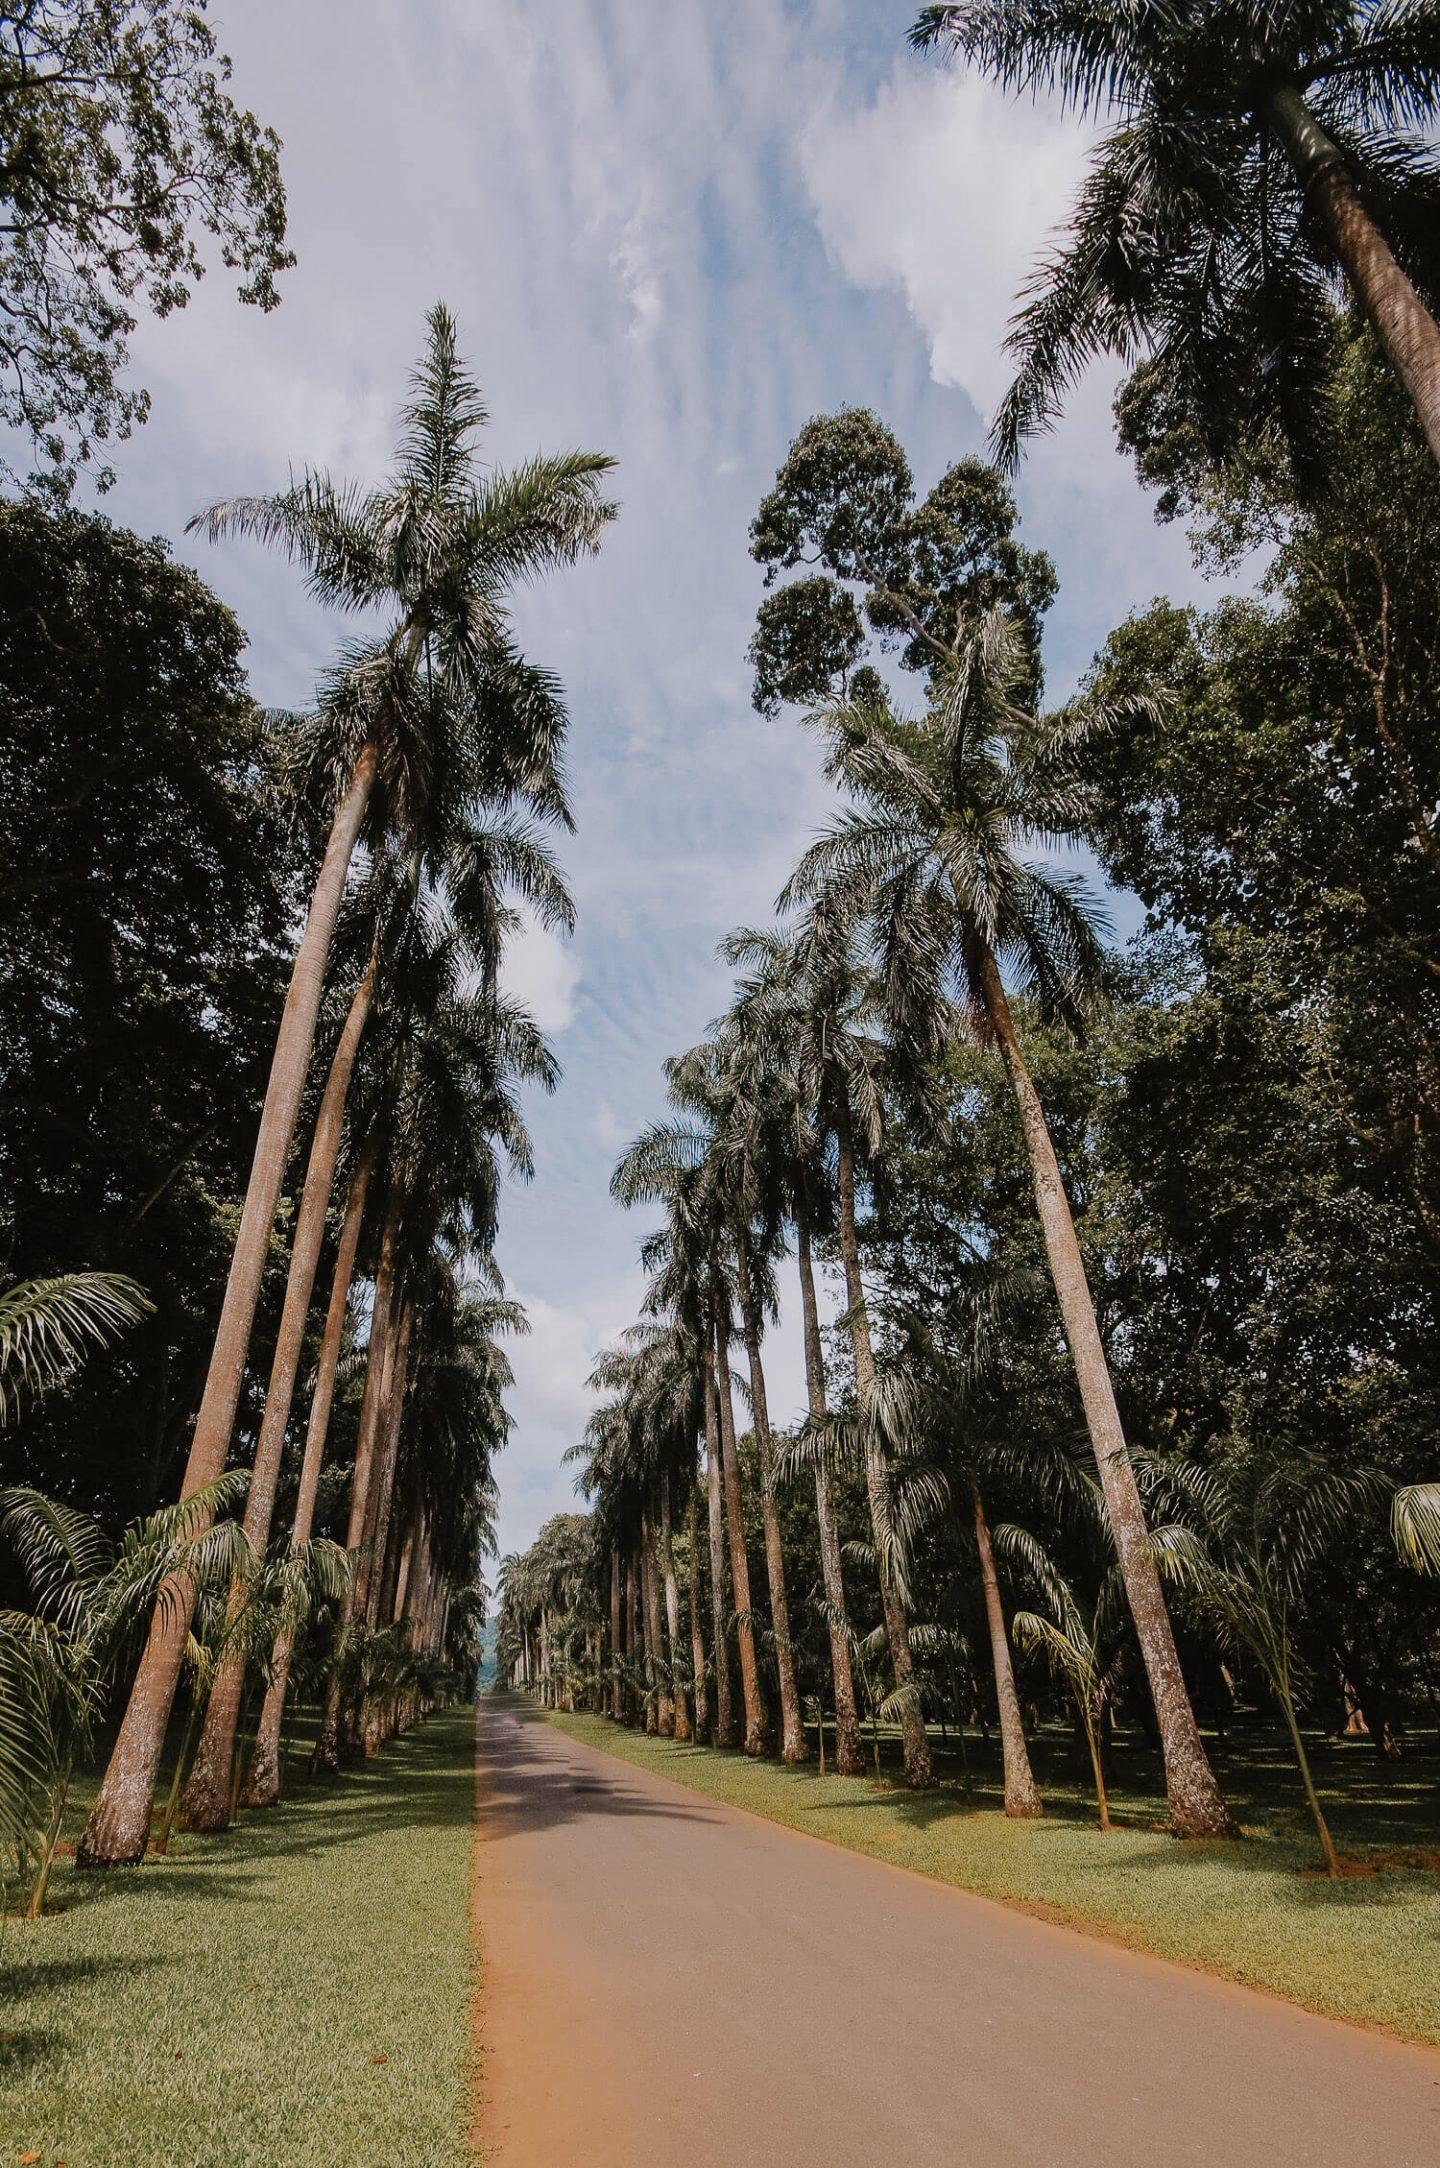 Royal Botanical Gardens Kandy Sri Lanka